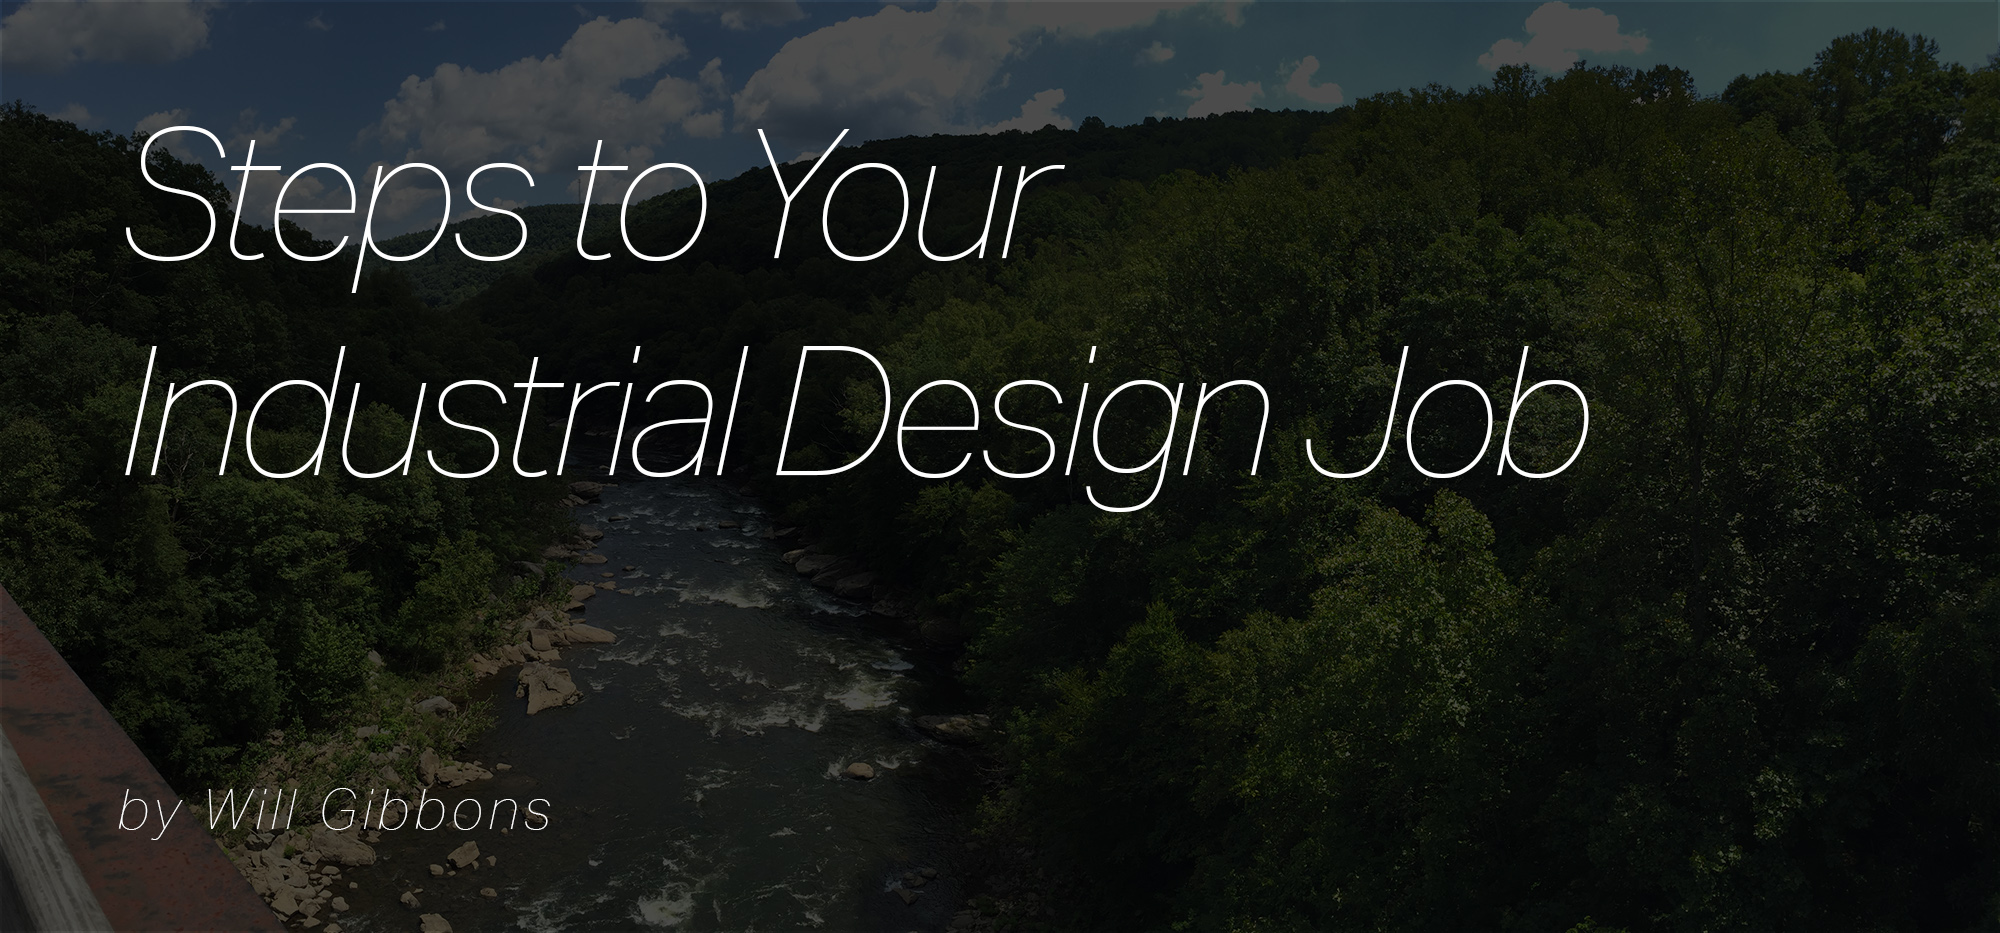 industrial design job will gibbons design